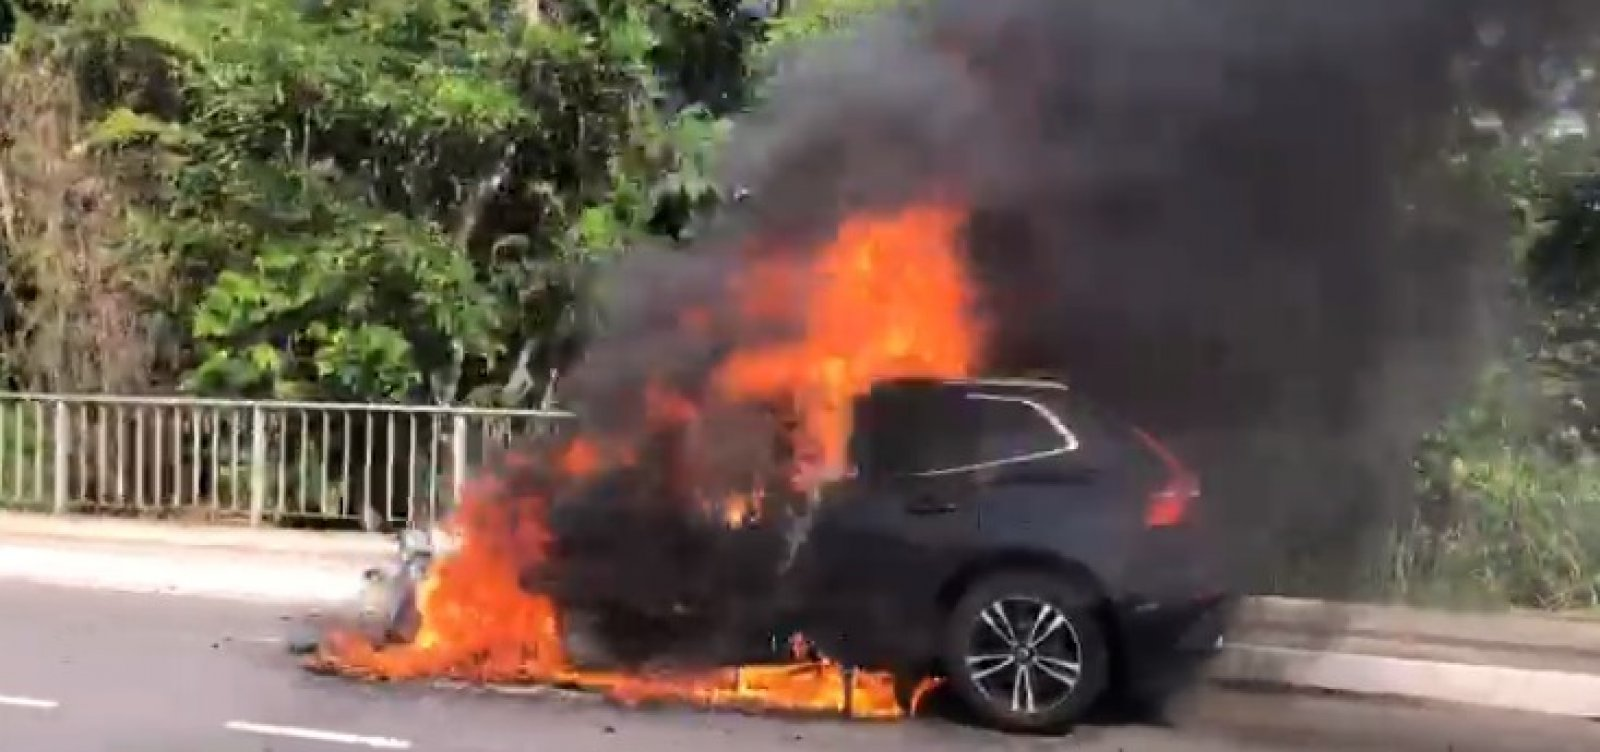 Carro pega fogo na Avenida Paralela; veja vídeo